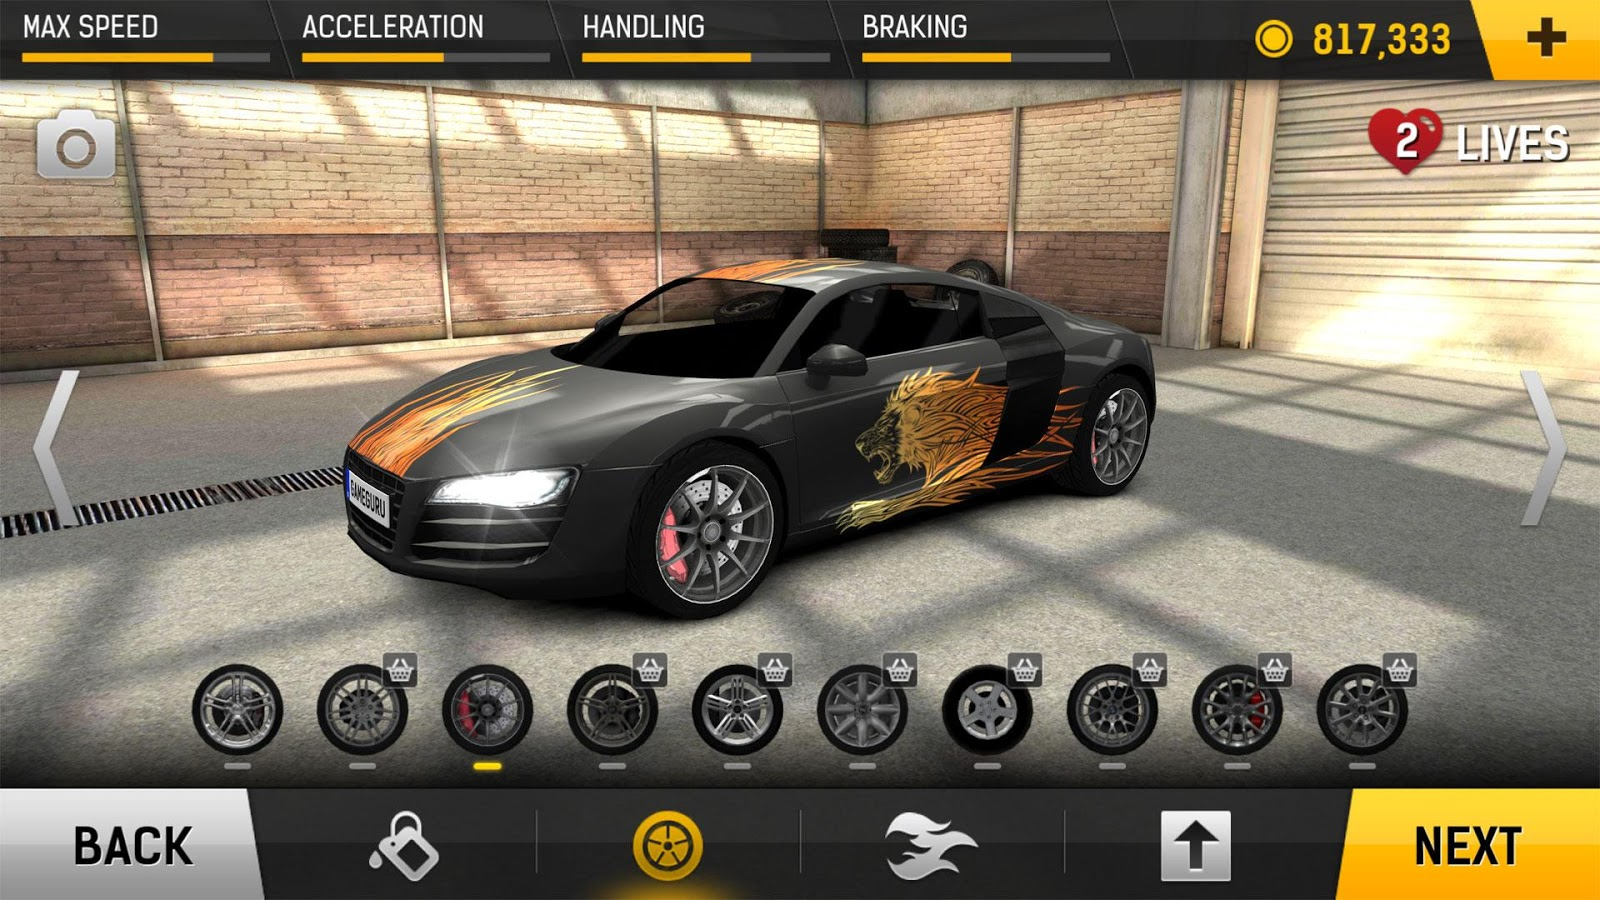 Racing Moto Fever на Android скачать бесплатно - Nine Store